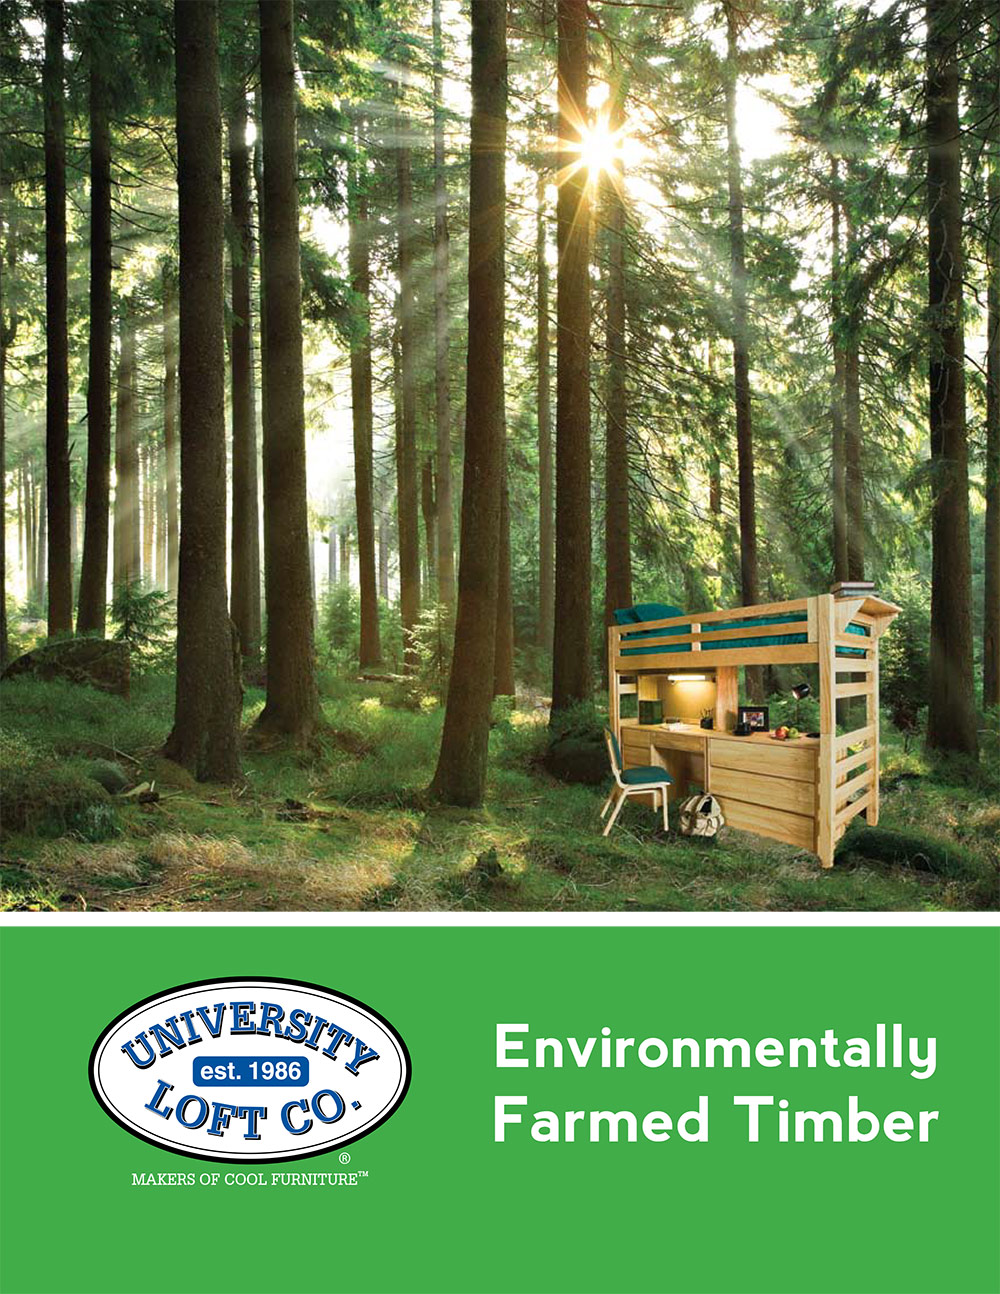 Environmentally Farmed Timber